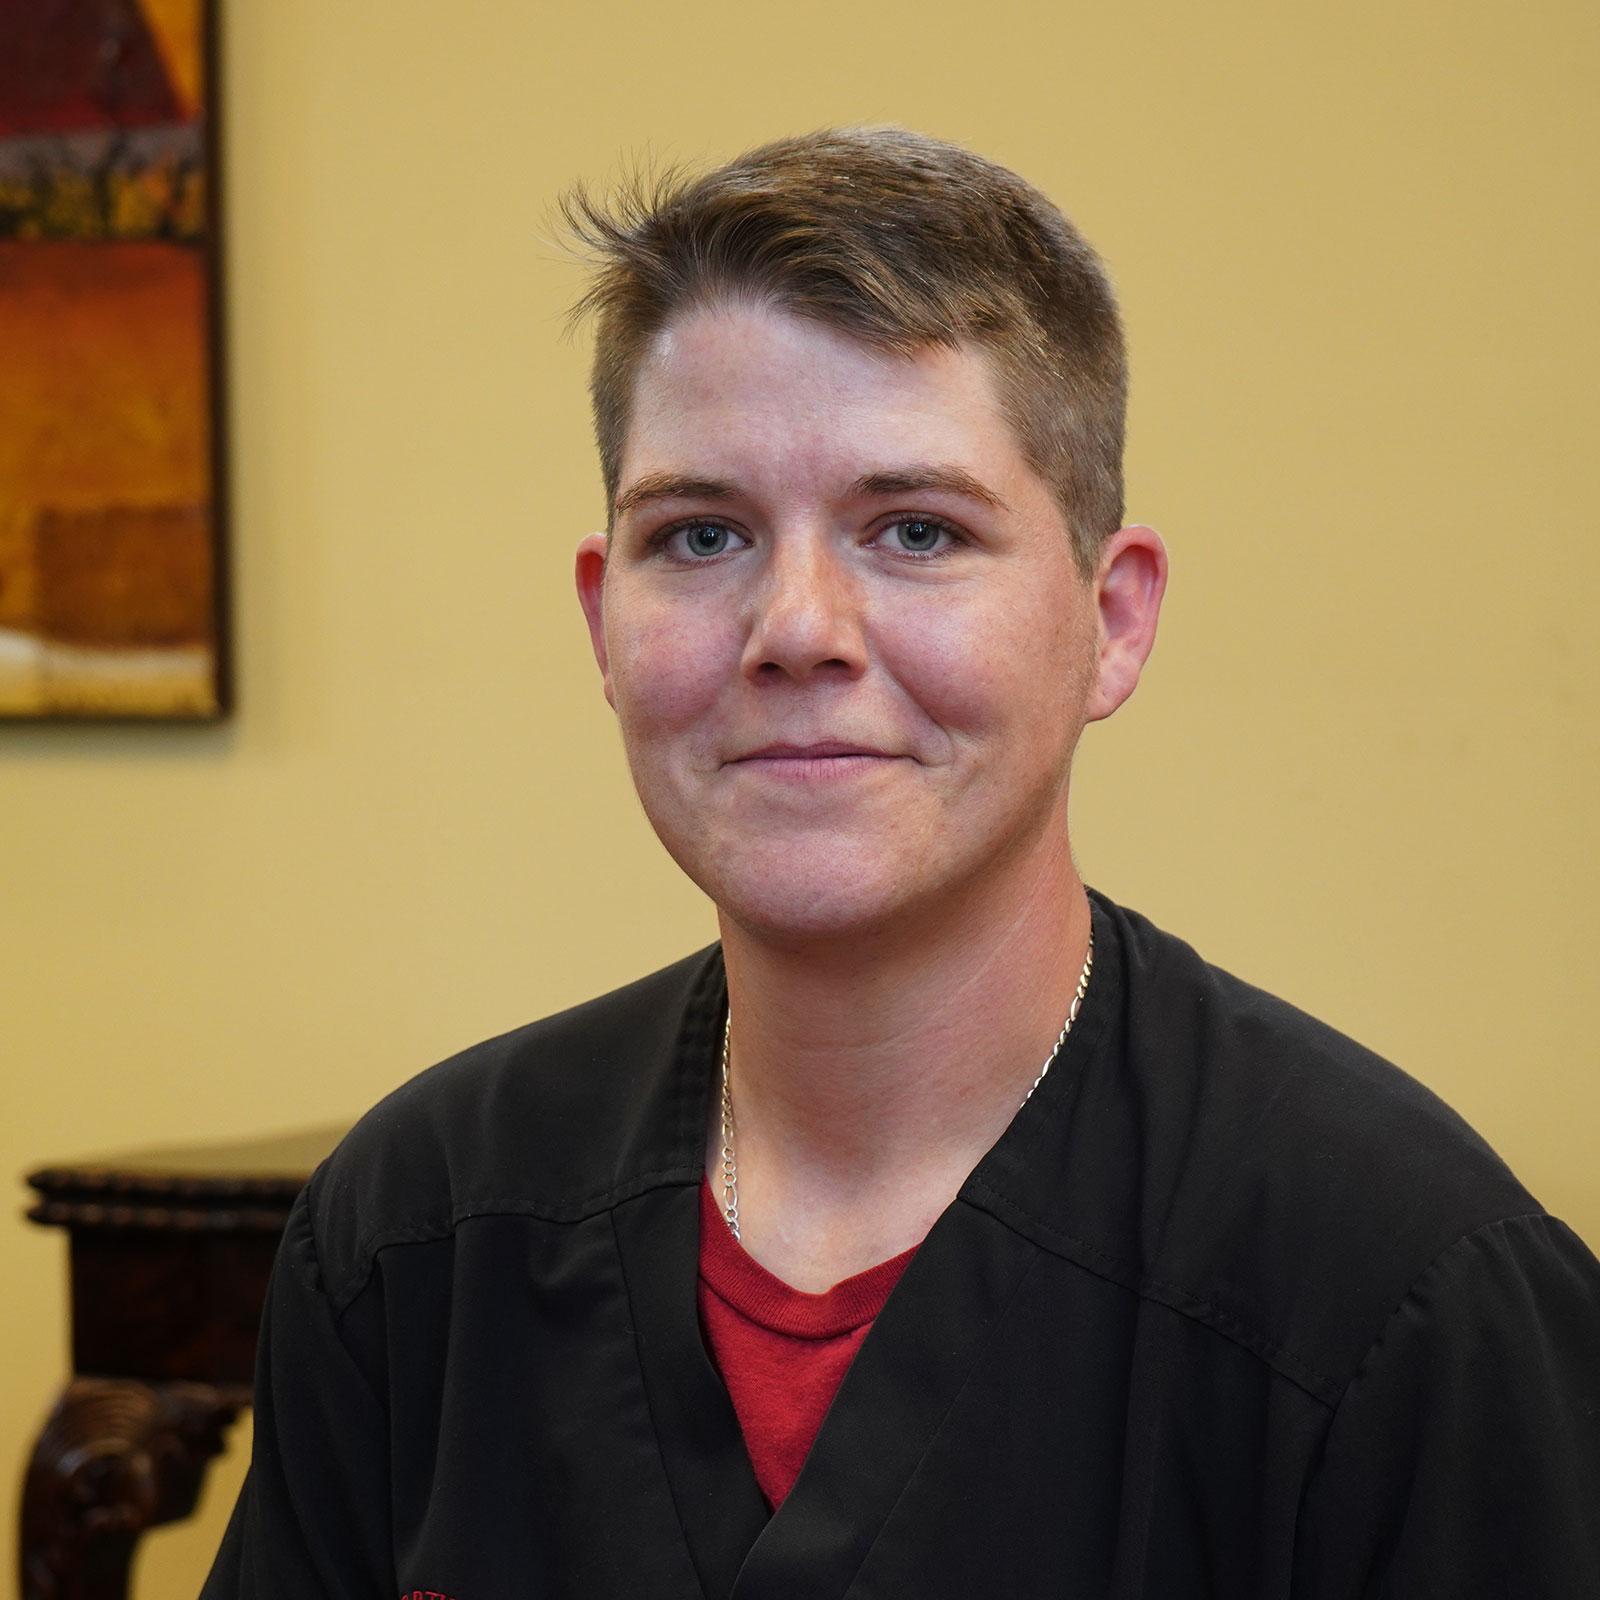 Brittney Crawford, Surgeon's Assistant